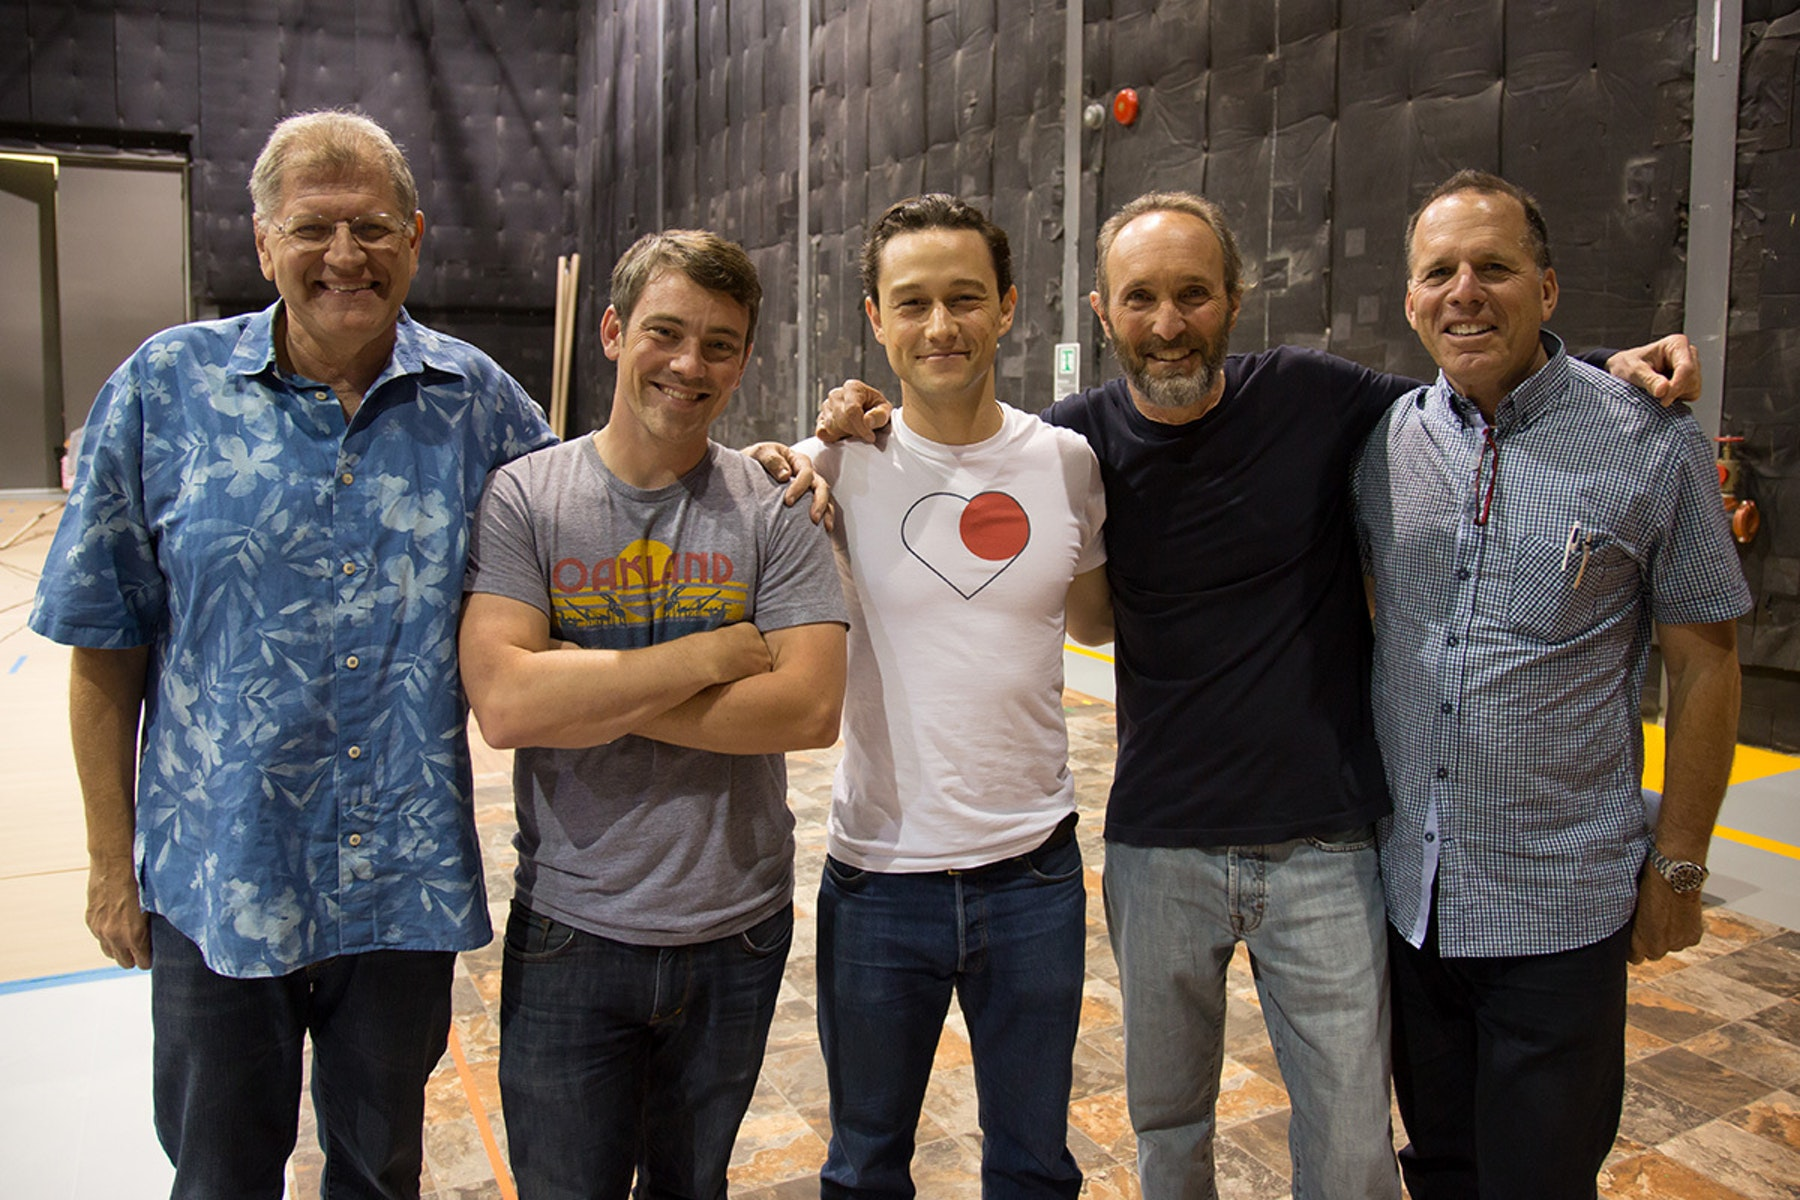 Director Bob Zemeckis, visual effects supervisor Kevin Baillie, actor Joseph Gordon-Levitt and producers Steve Starkey and Jack Rapke on the set of The Walk.